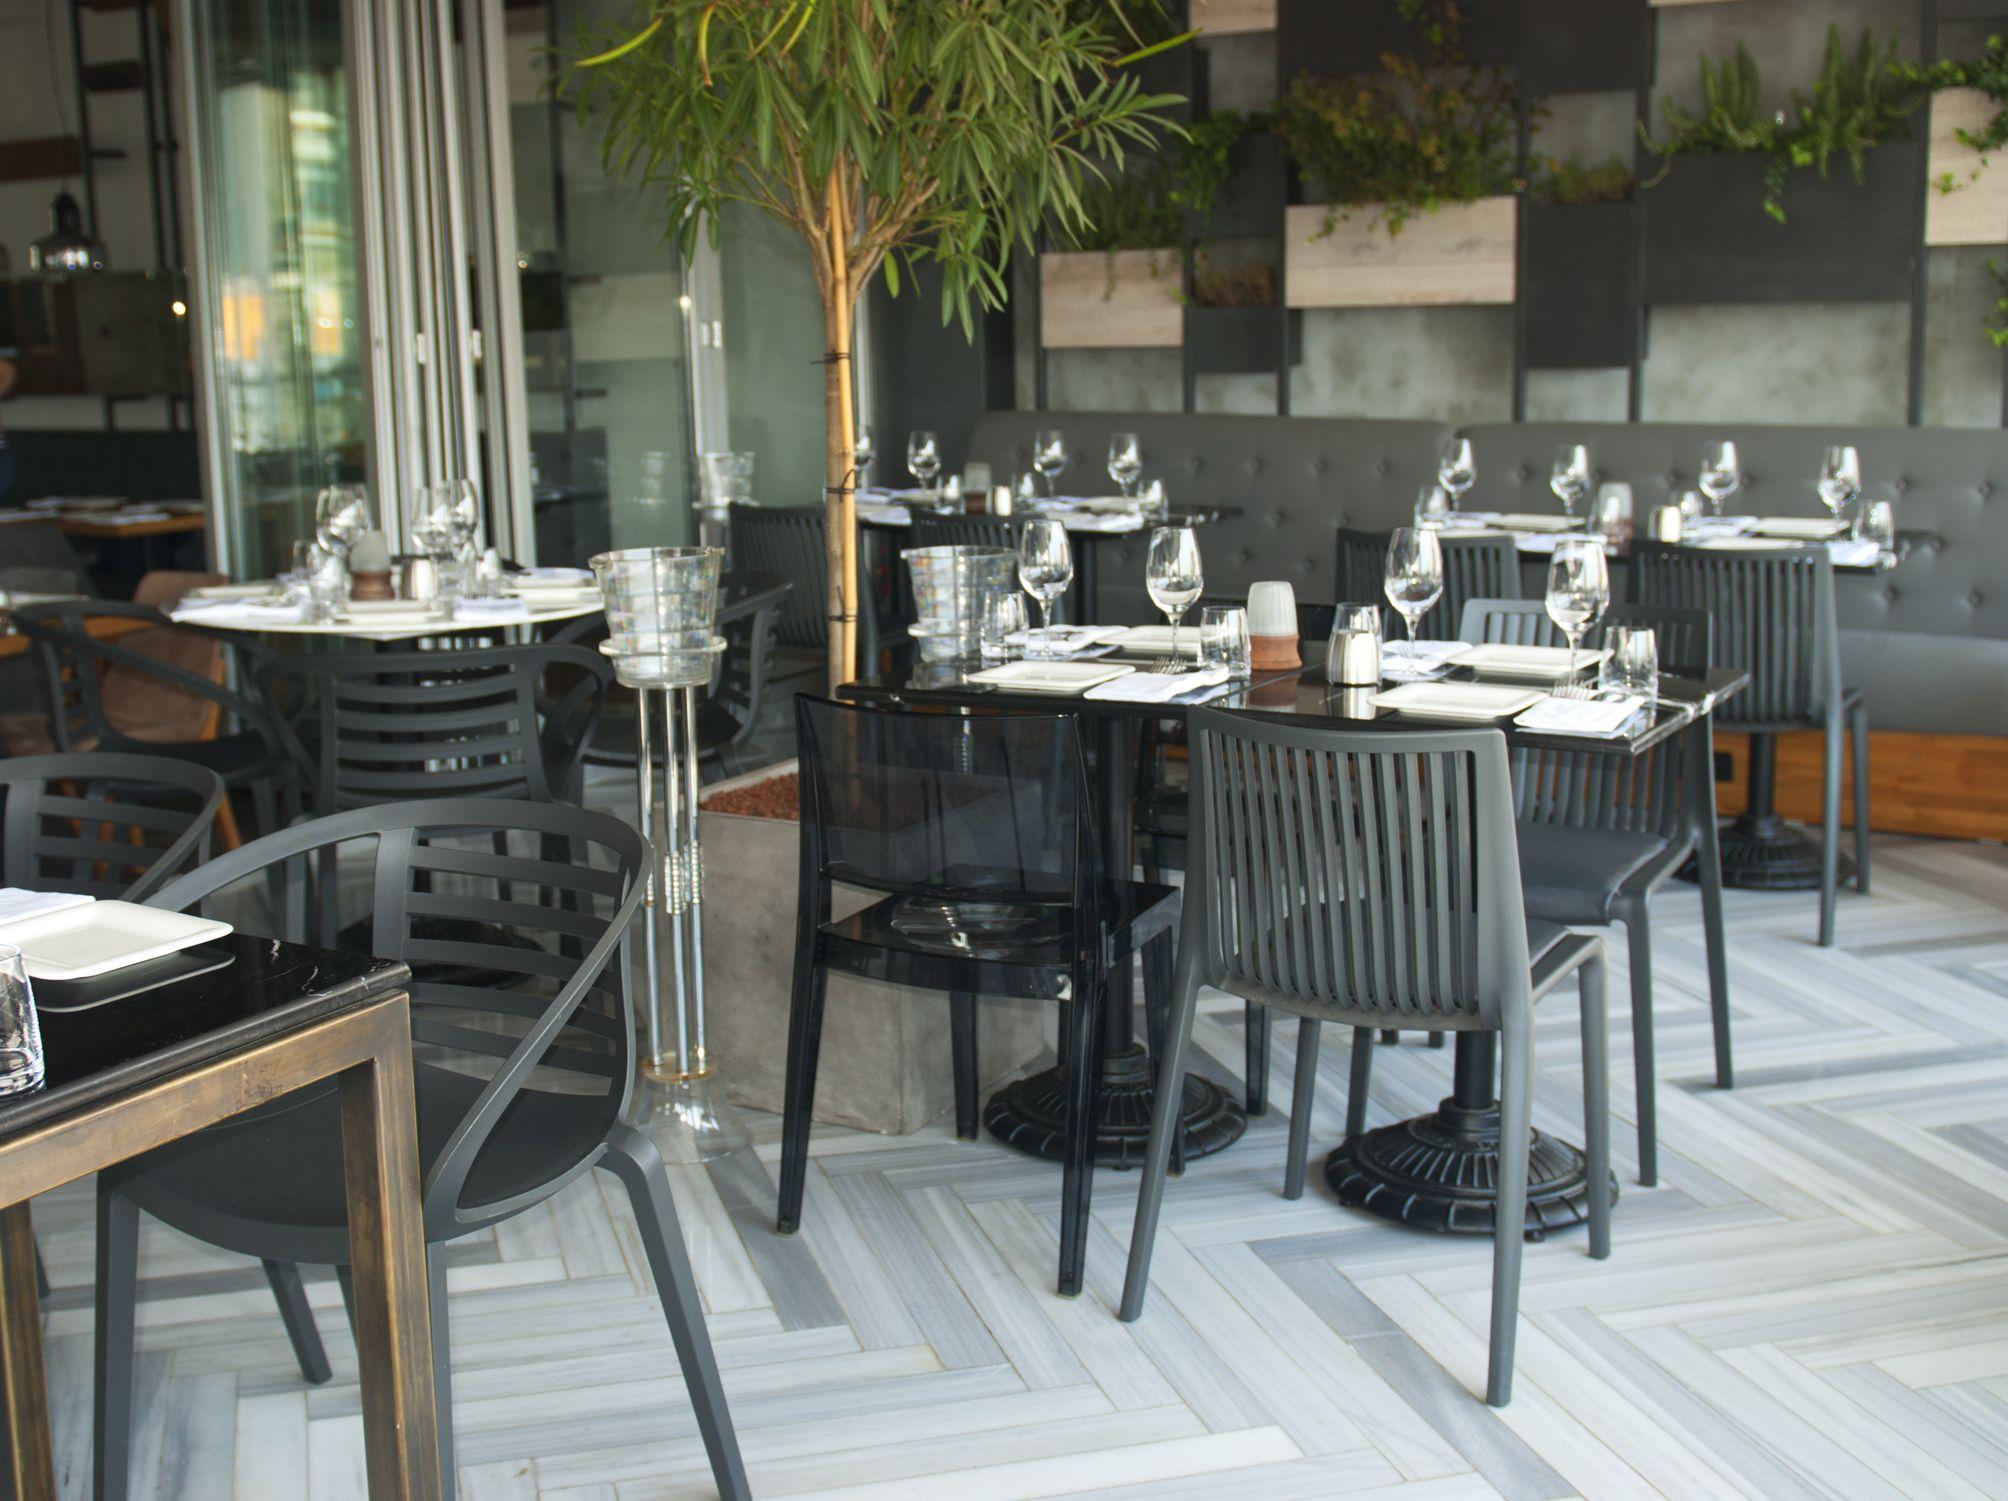 Papatya Chair Restaurant Dining Garden Outdoor Stackable Endearing Restaurant Dining Room Chairs Design Inspiration